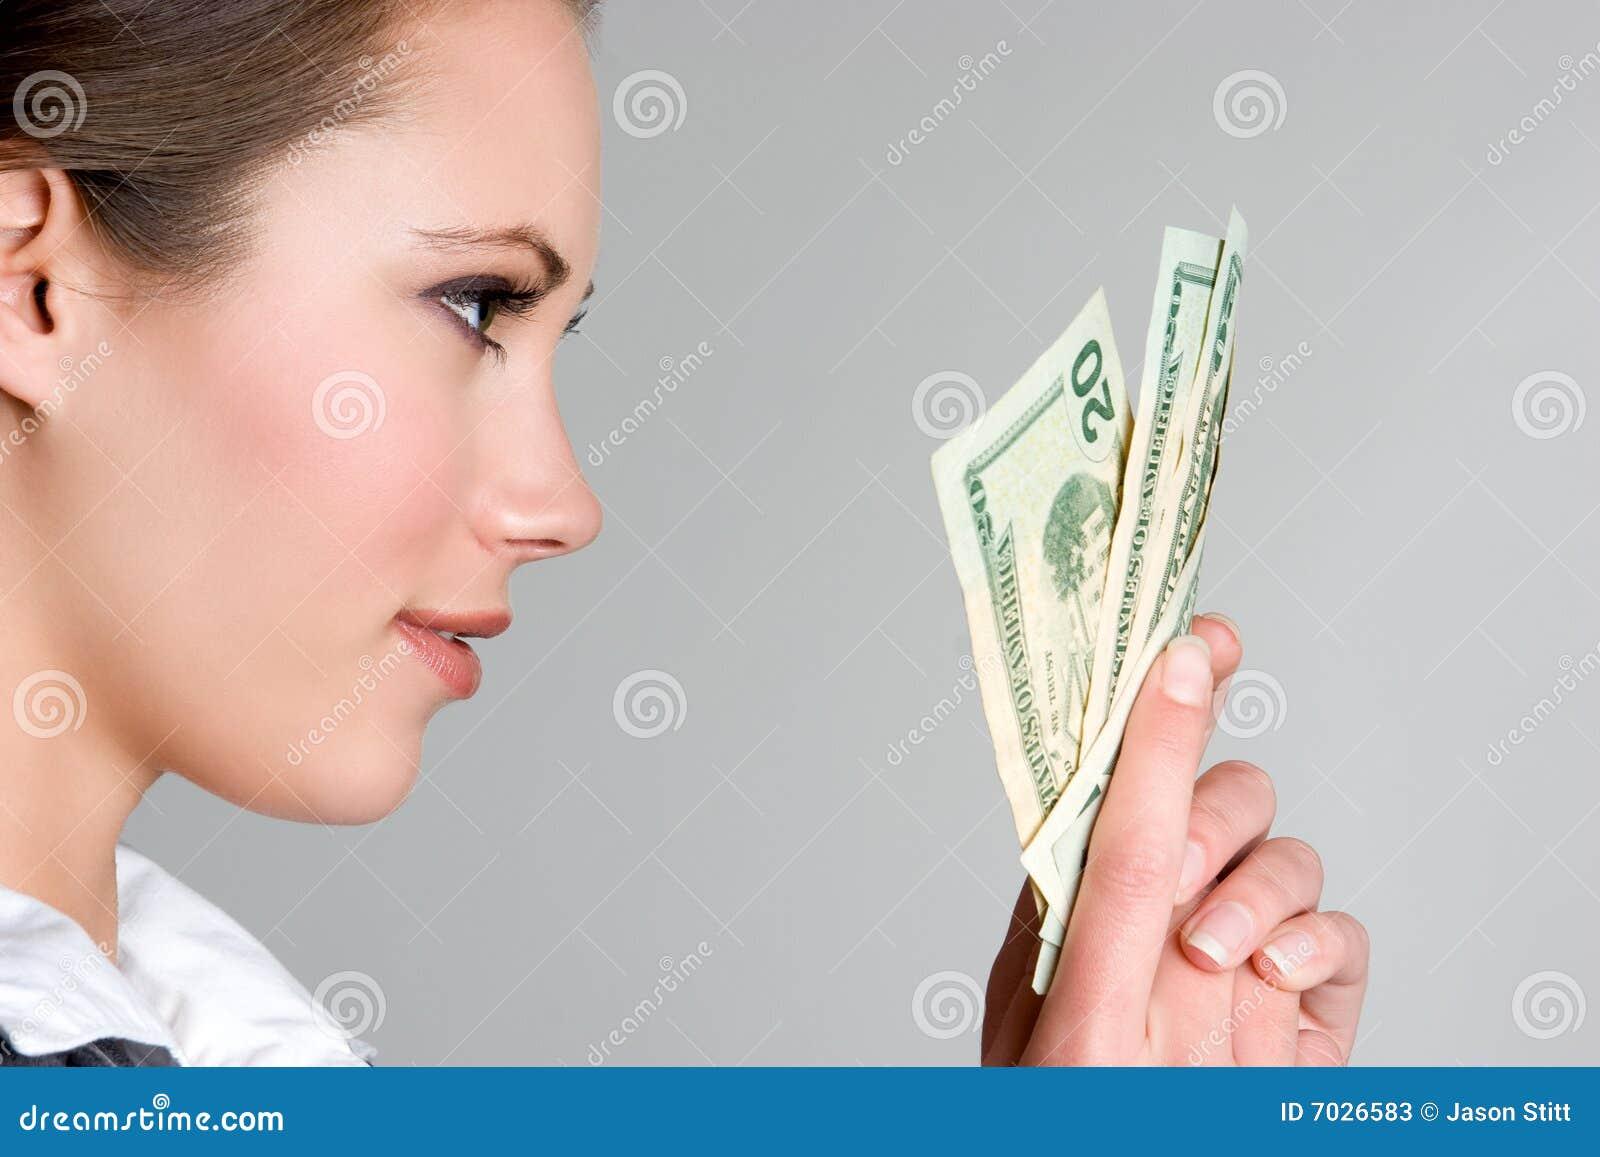 Woman Holding Money Stock Photos - Image: 7026583